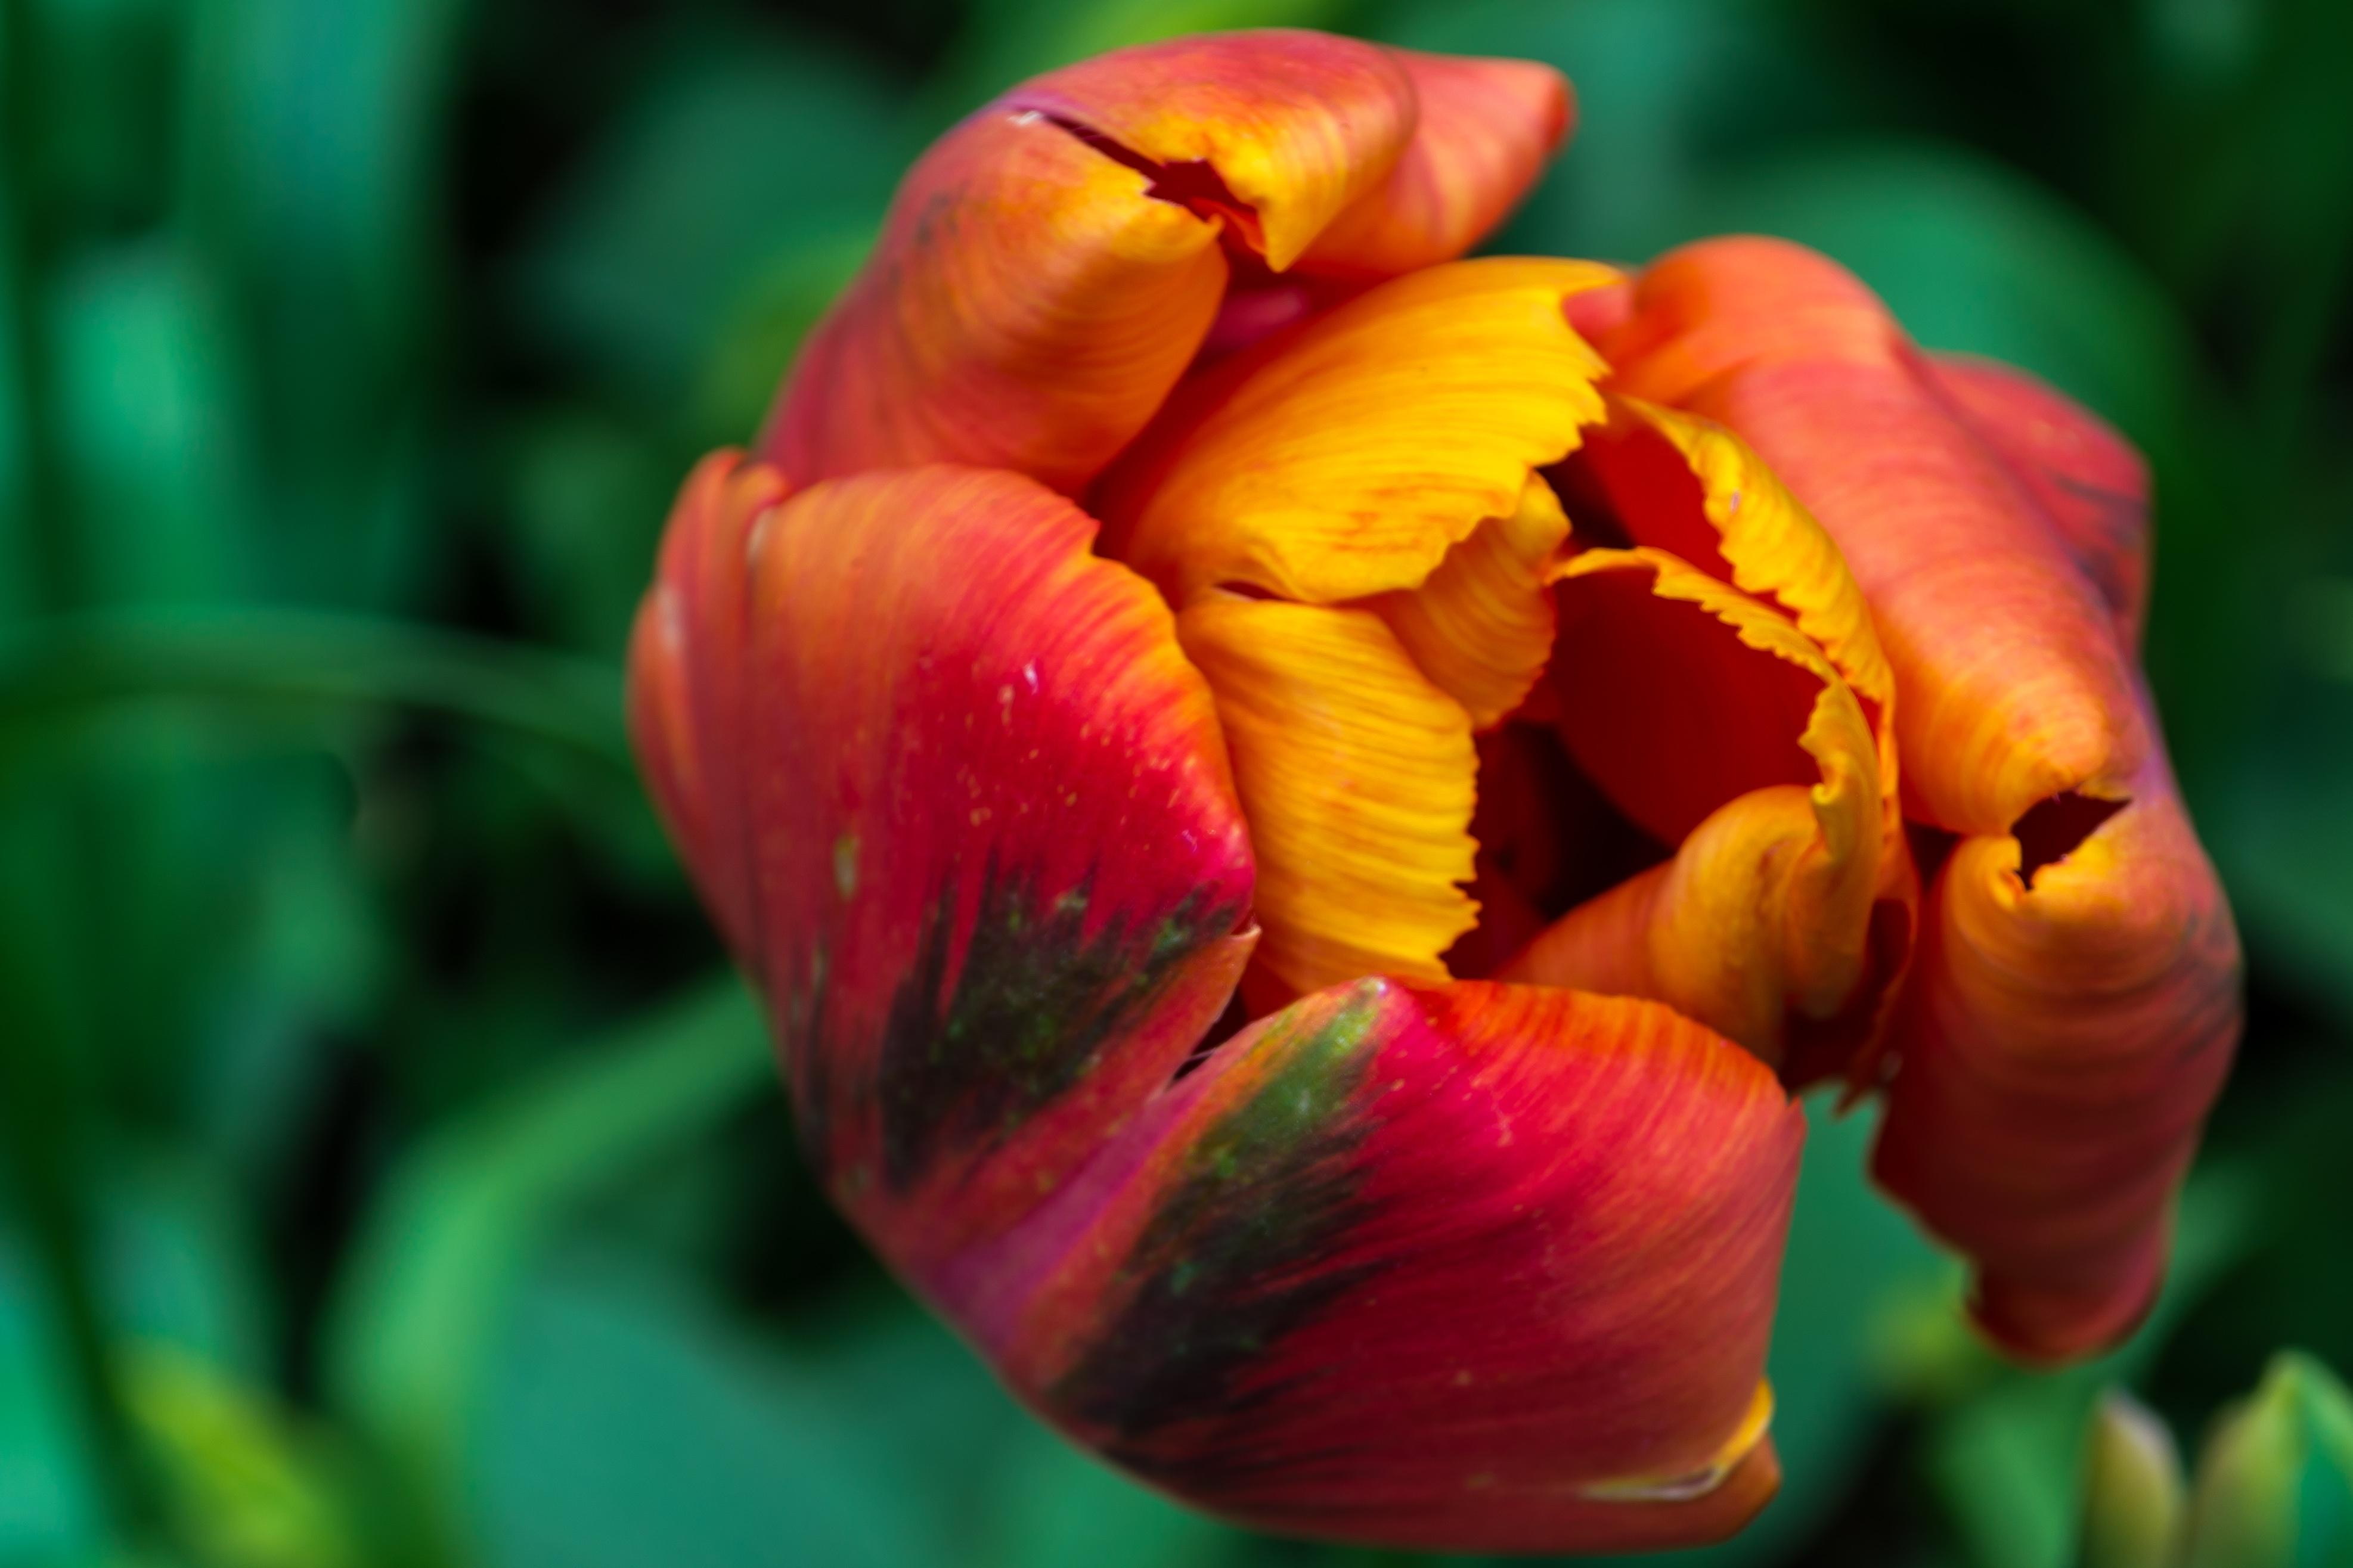 Rose, Fragrance, Garden, Nature, Park, HQ Photo